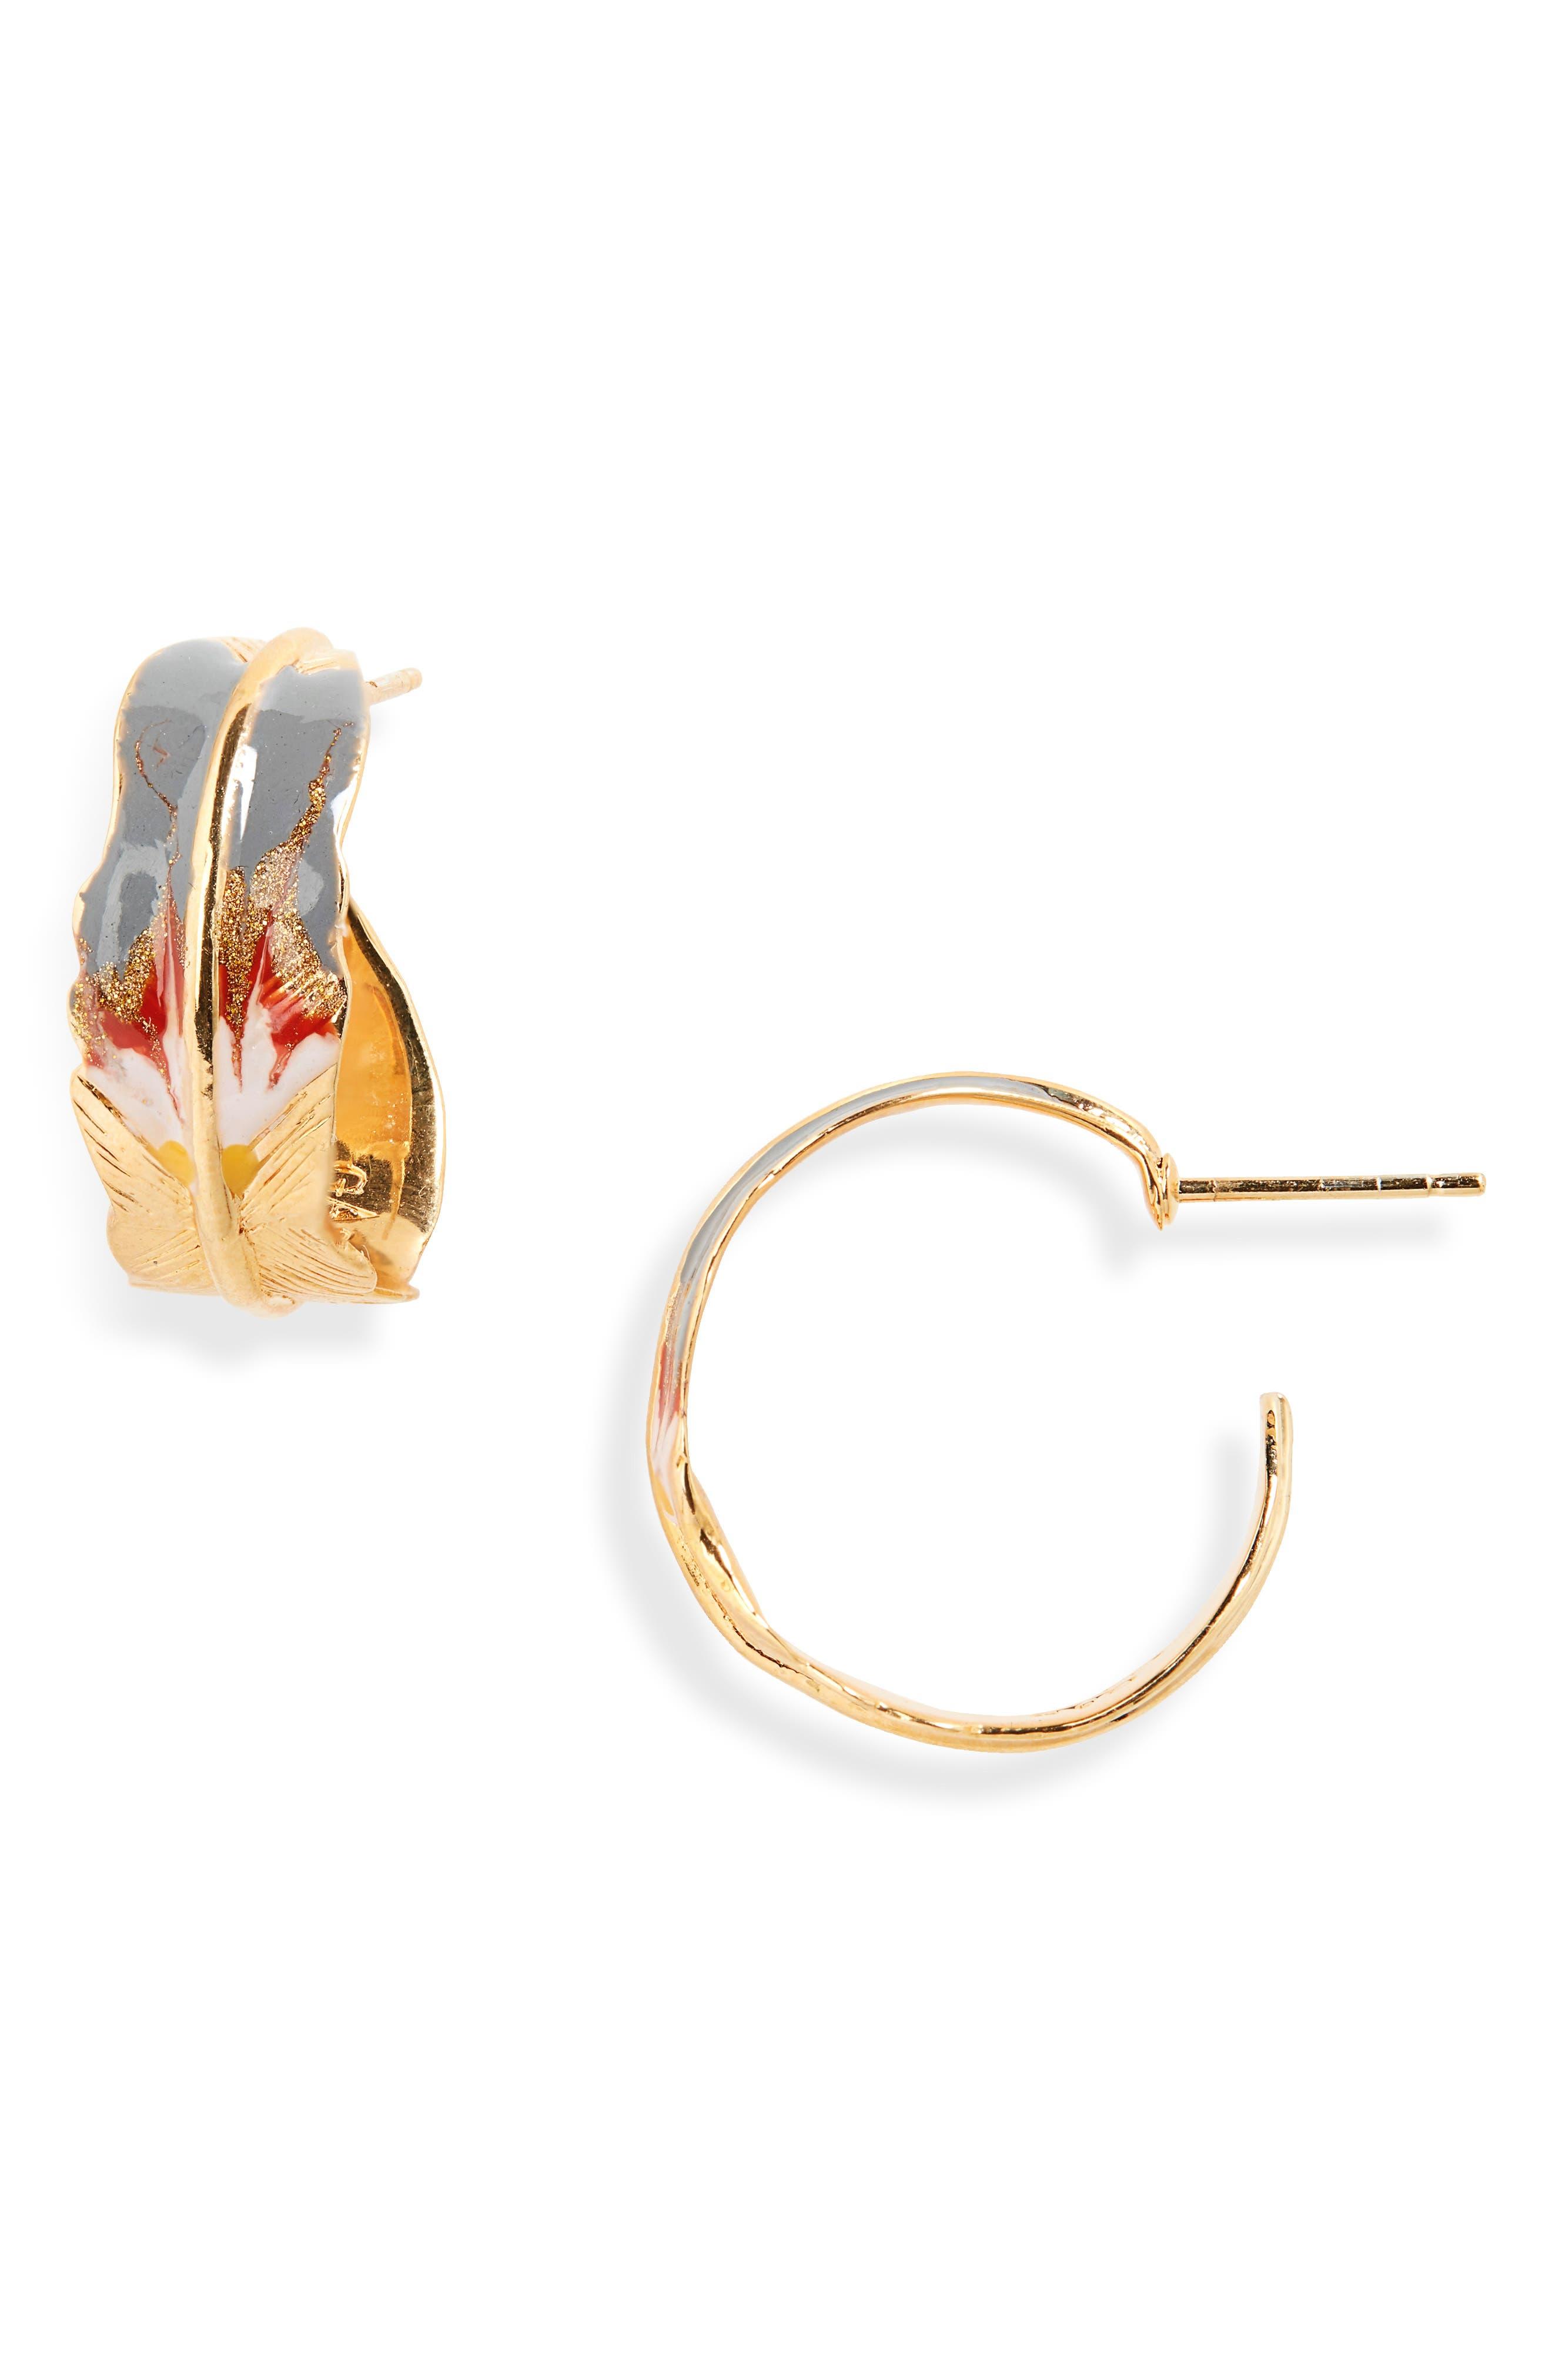 GAS BIJOUX Penna Hoop Earrings in Gold